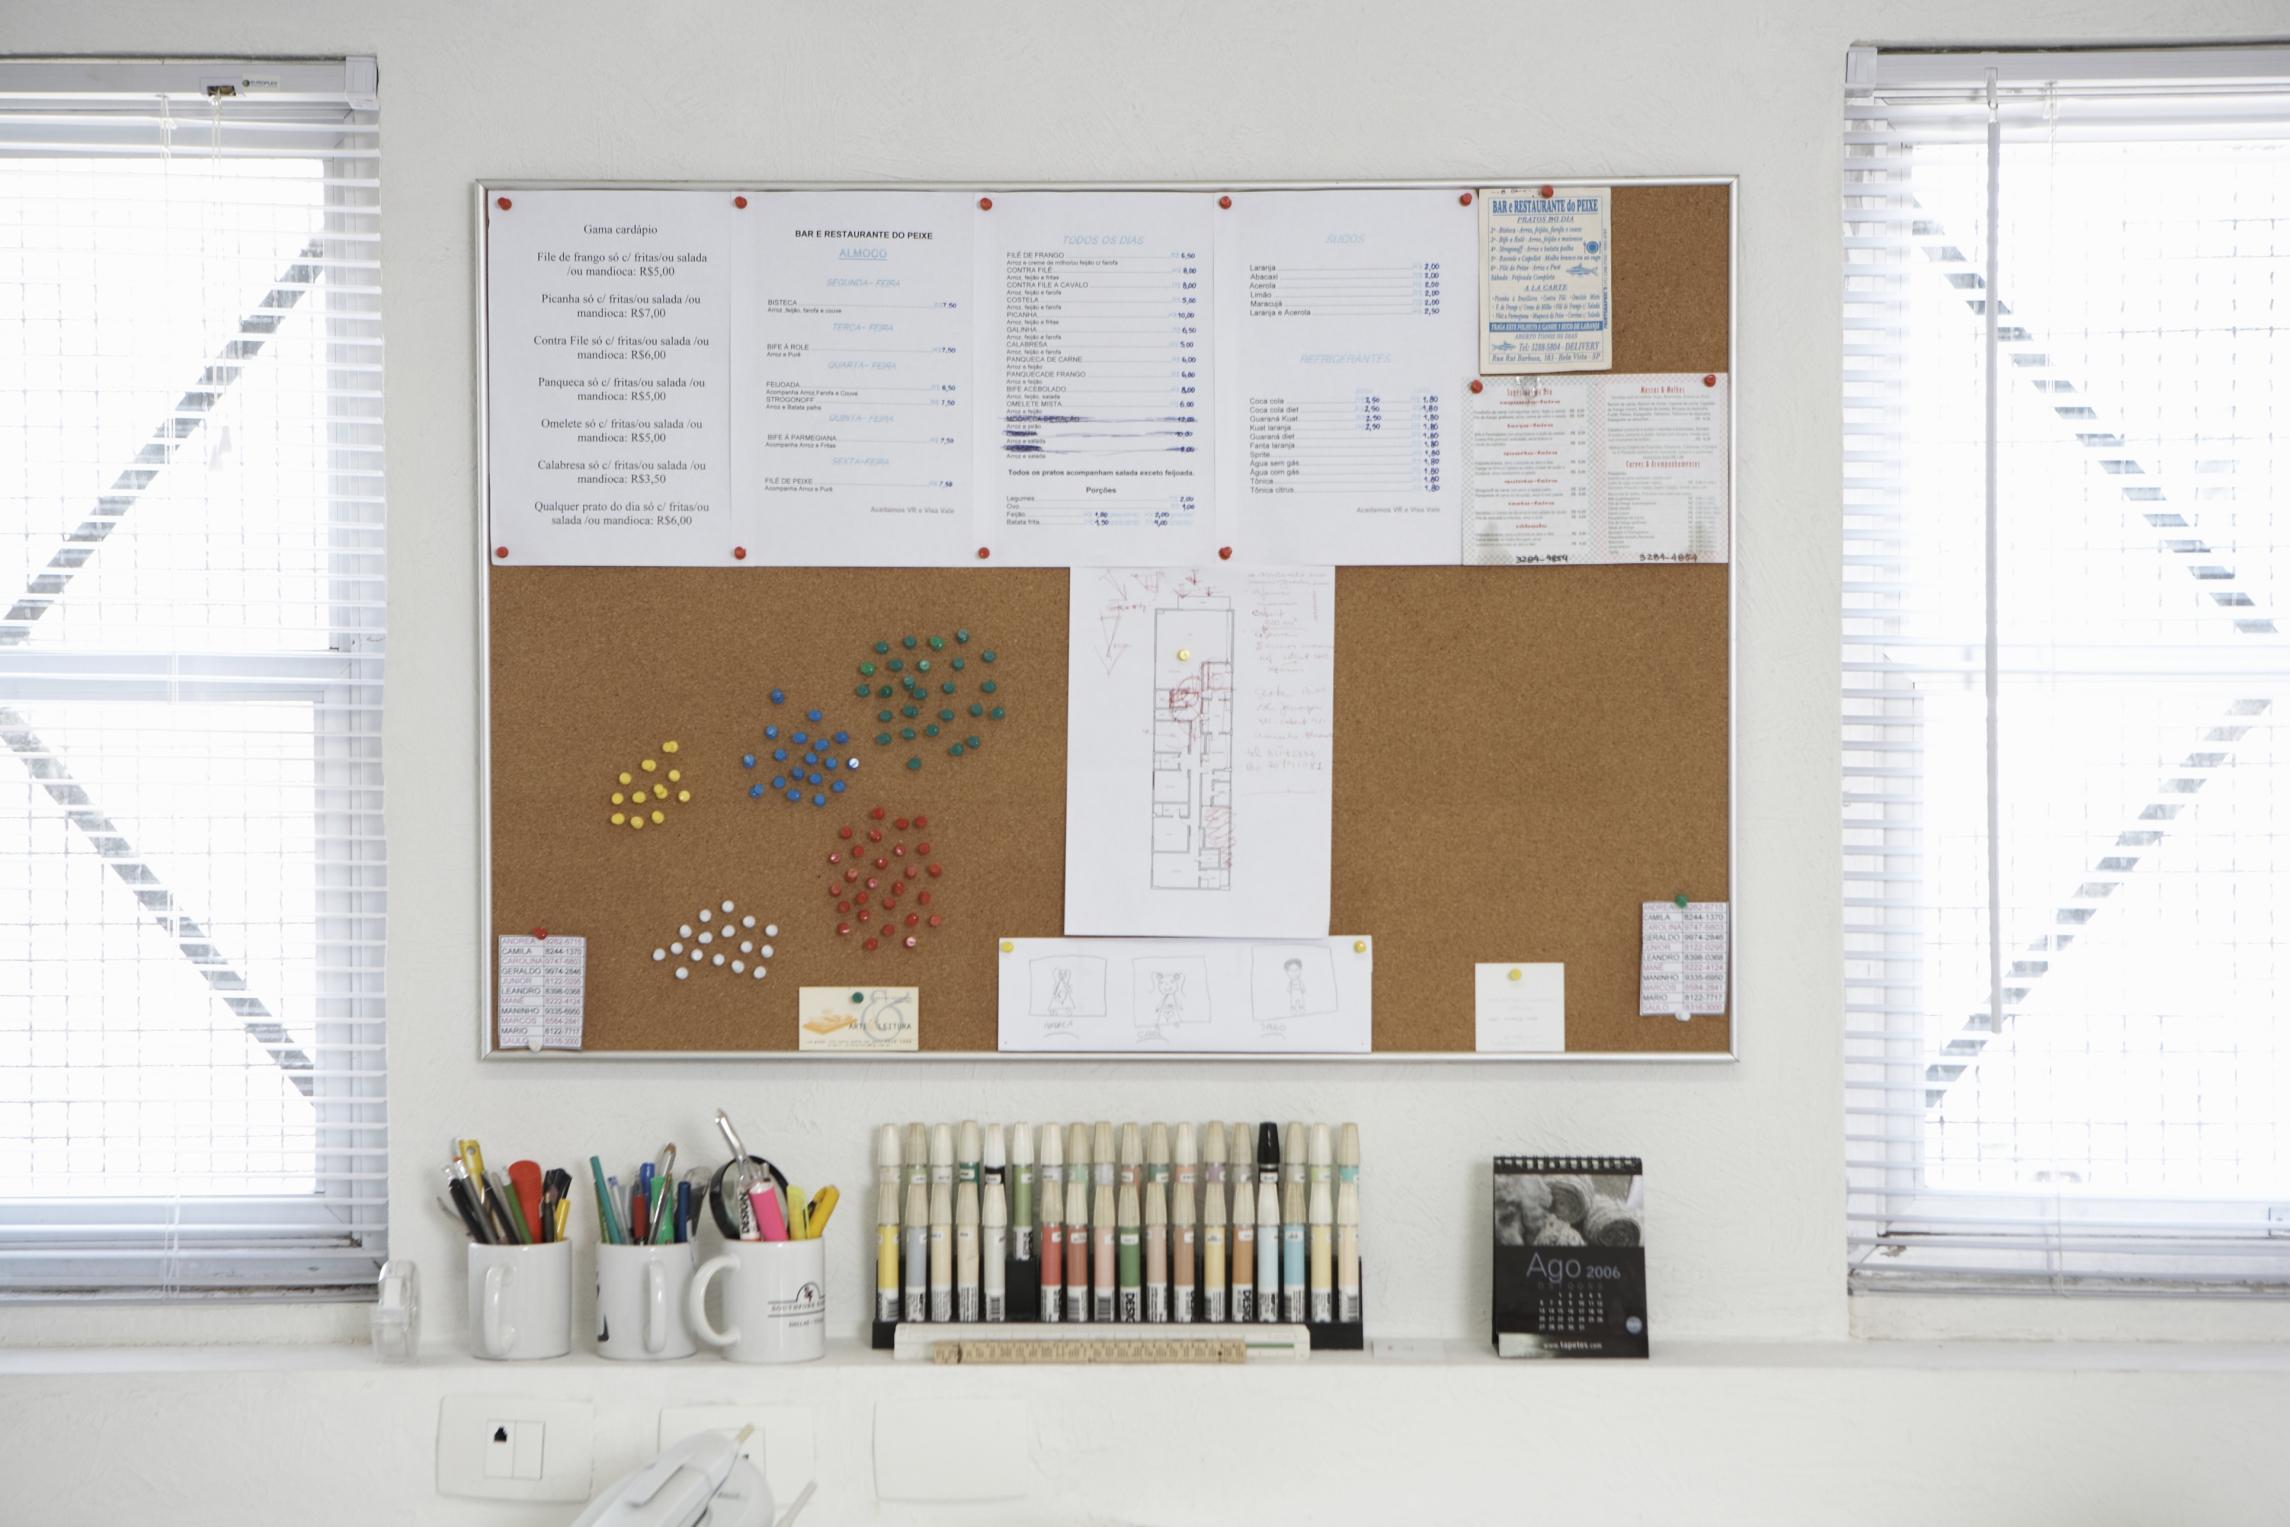 Professional Bulletin Board Ideas Workplace